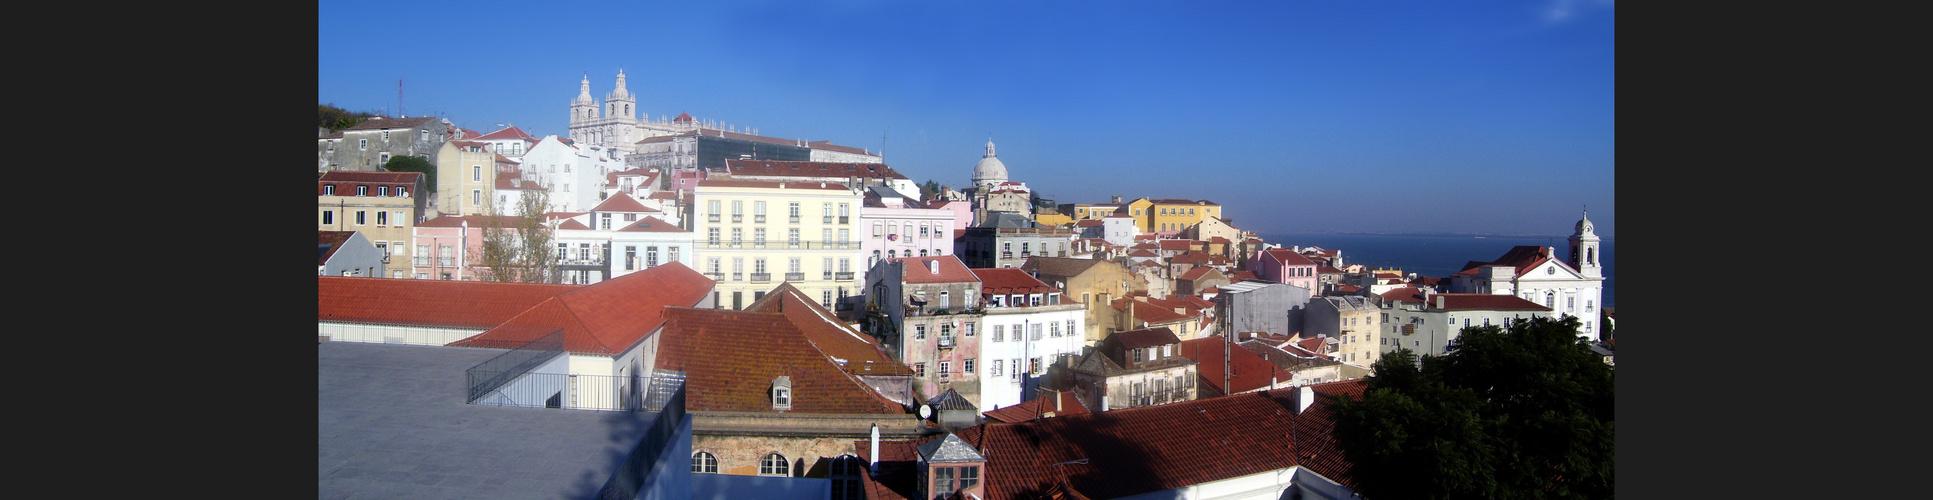 Lisboa: Der Stadtteil Alfama